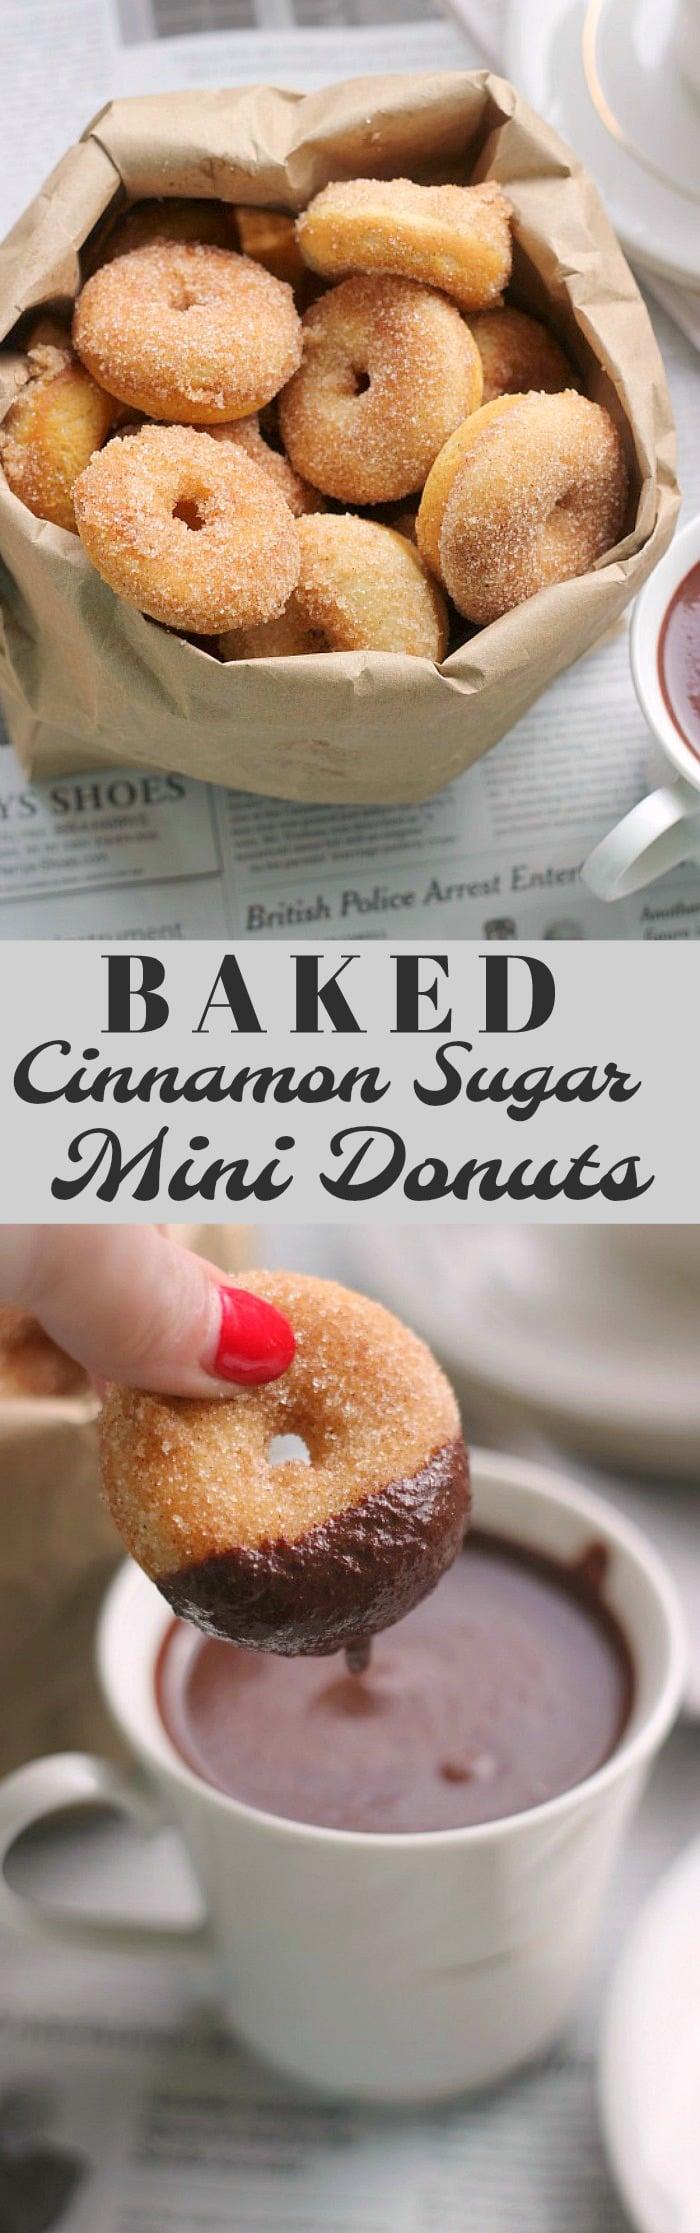 Bella Mini Donut Maker Manual Online User